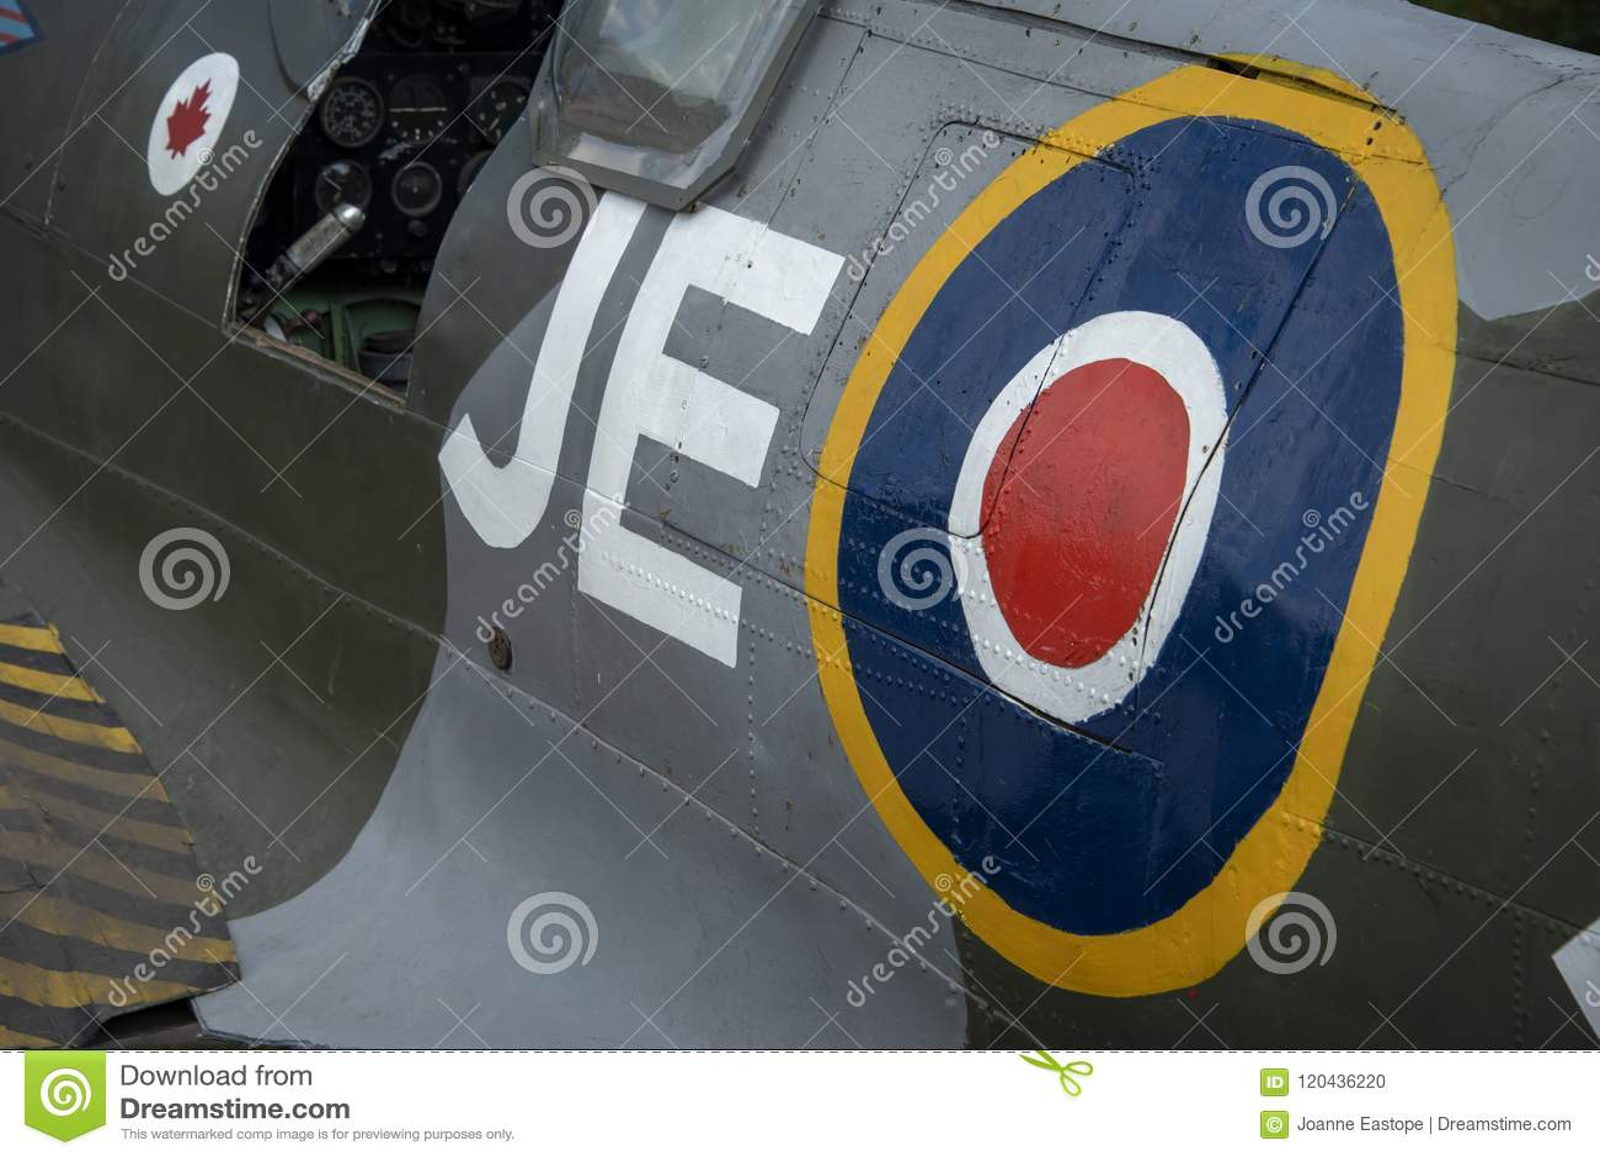 Spitfire Mk IX, сериал никакой EN398, JE-J